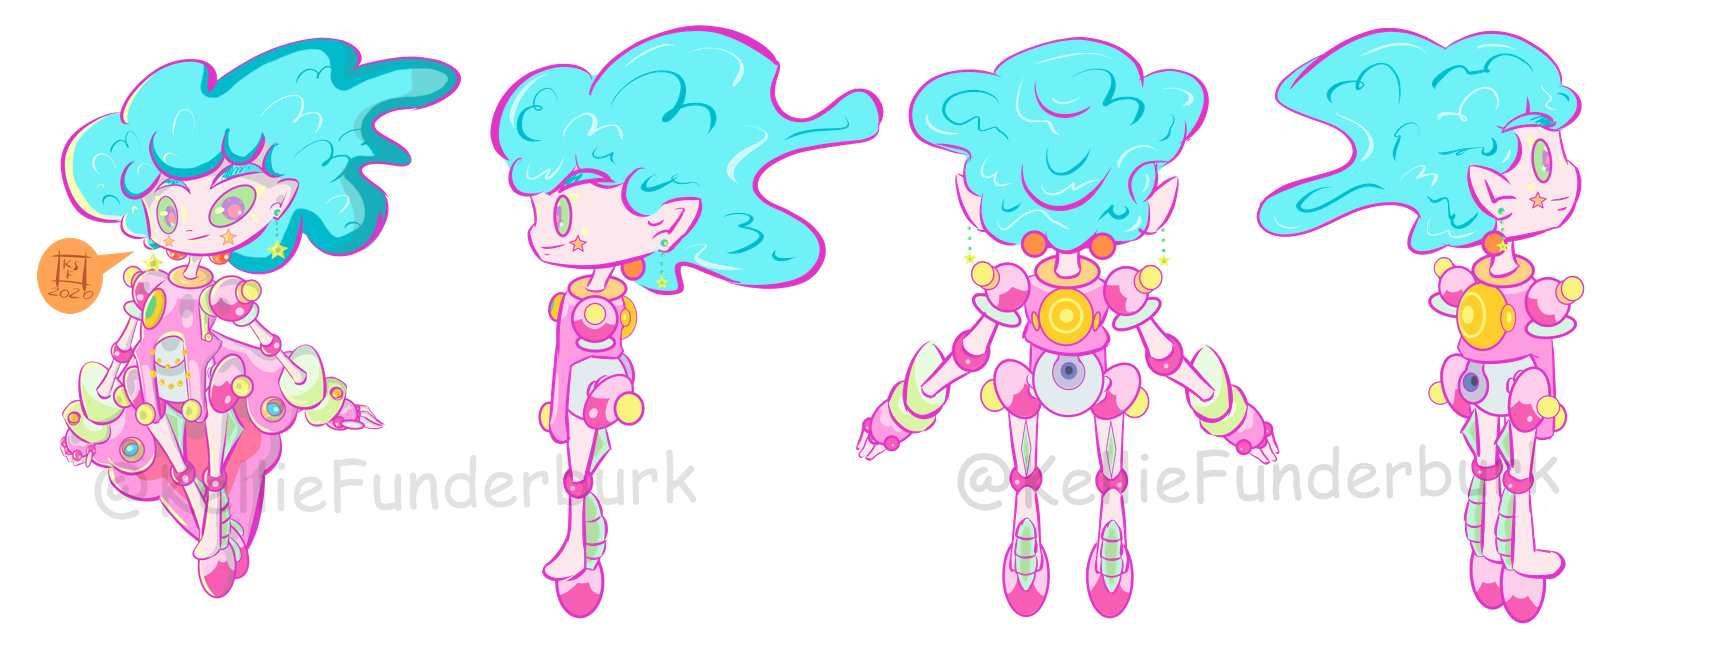 Pixie Bot Character Sheet